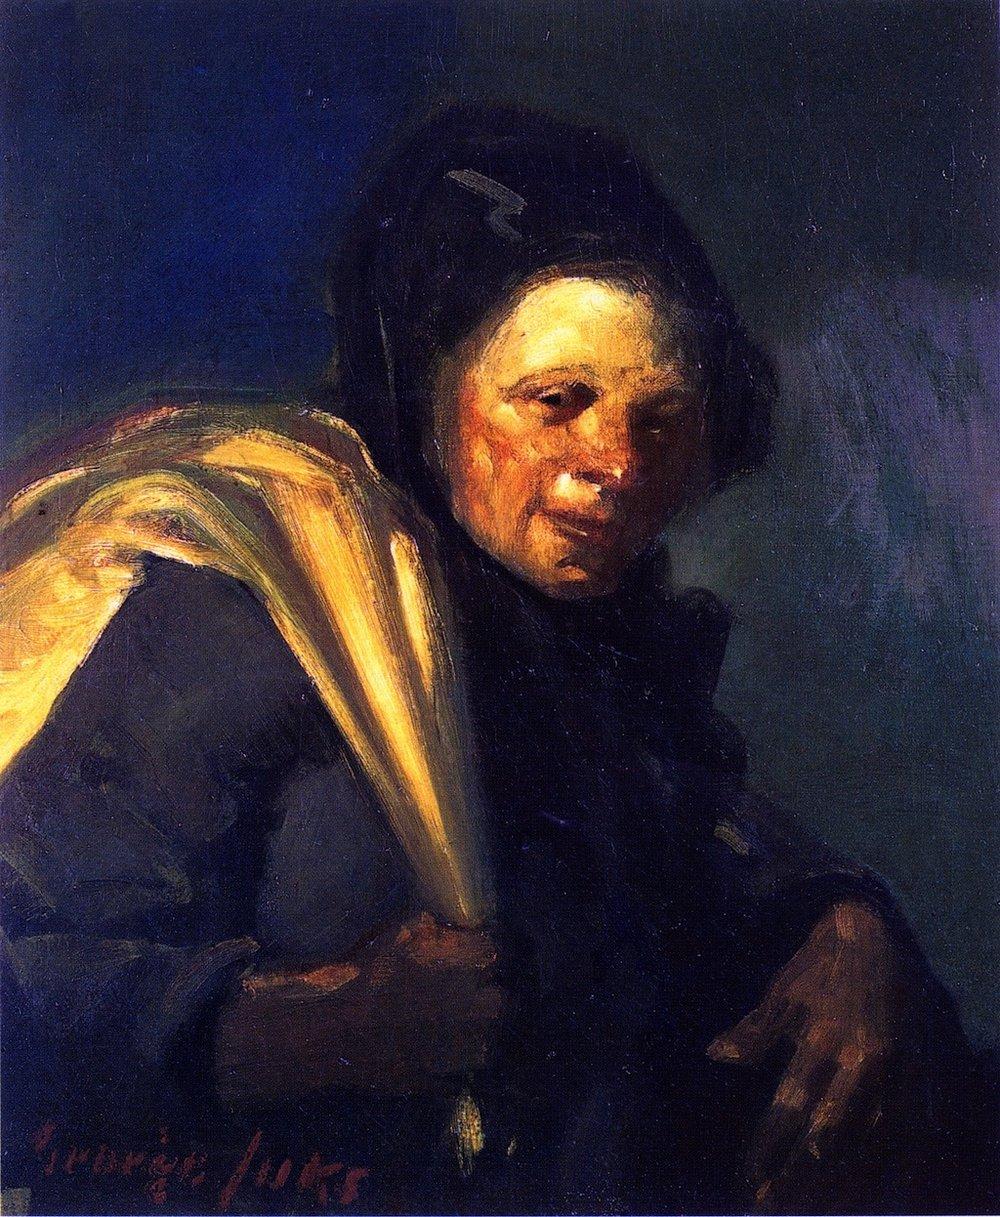 1905c-The-Rag-Picker-oil-on-canvas-66-x-55_9-cm.jpg